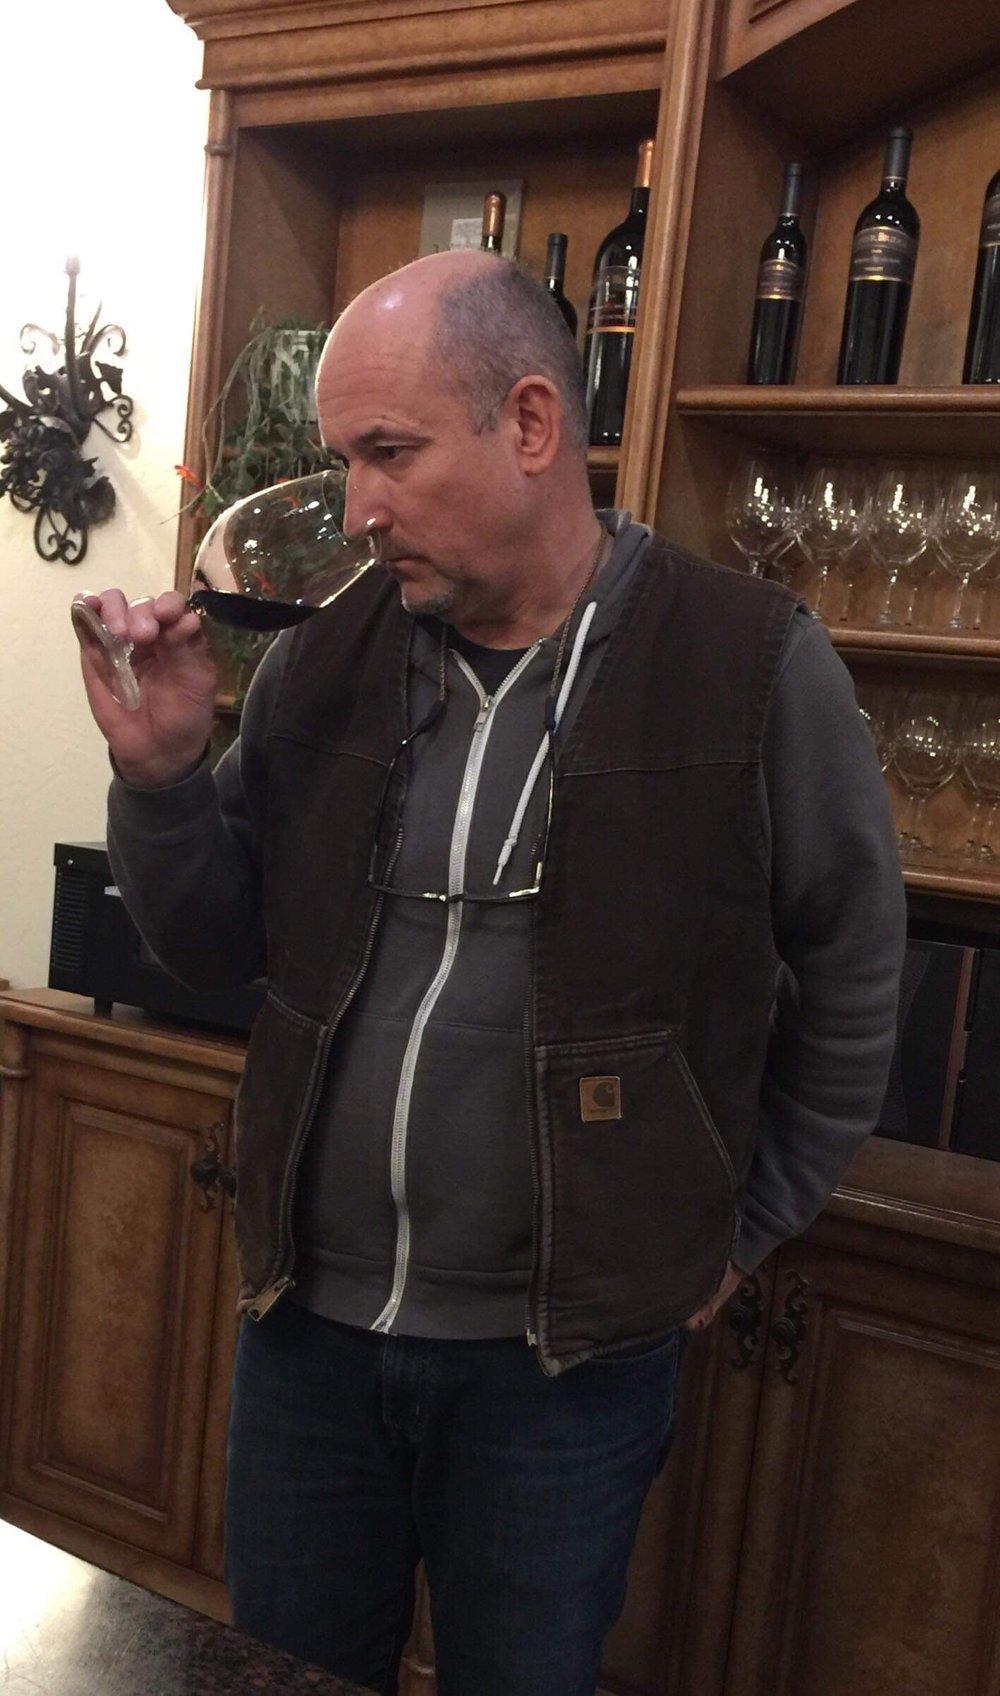 Winemaker Jean-François Pellet